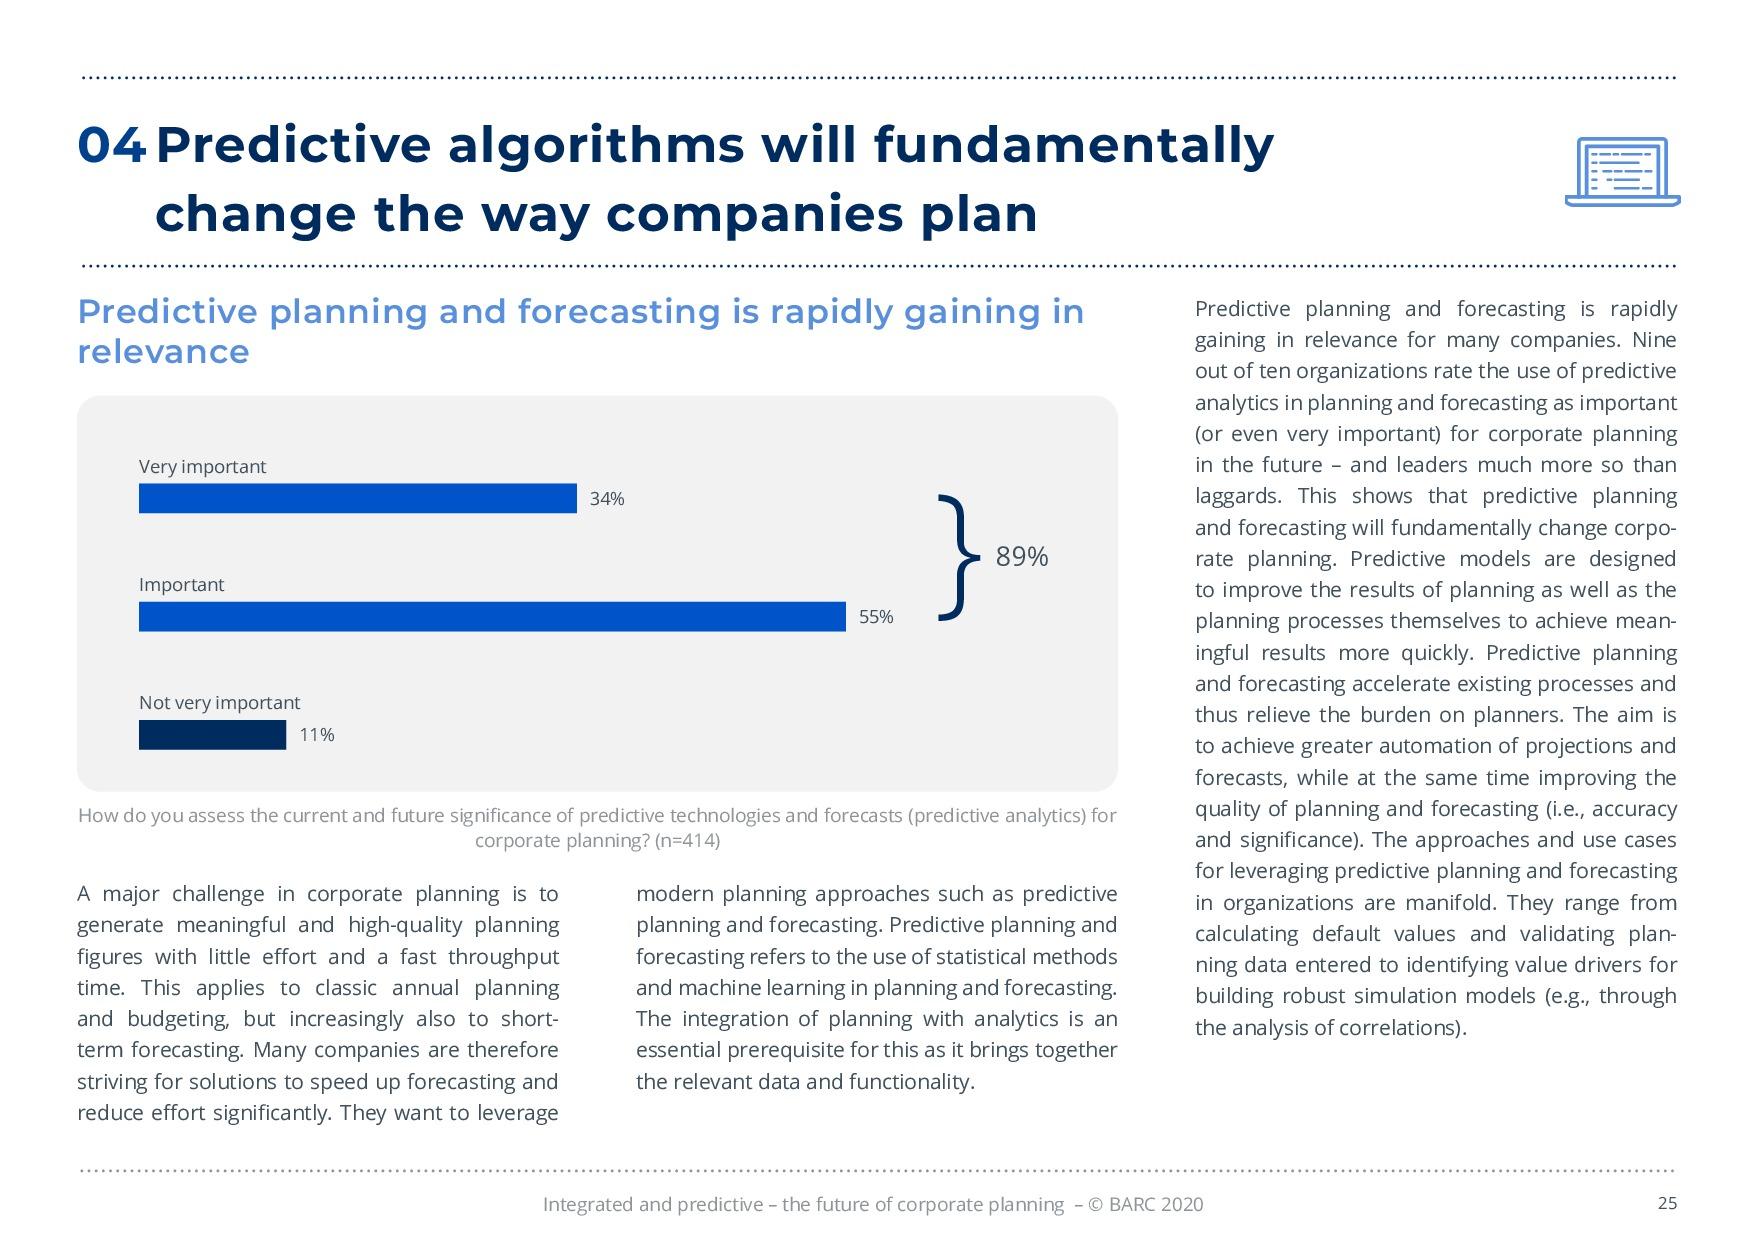 BARC – 統合と予測 – 経営計画の未来 | Page 25